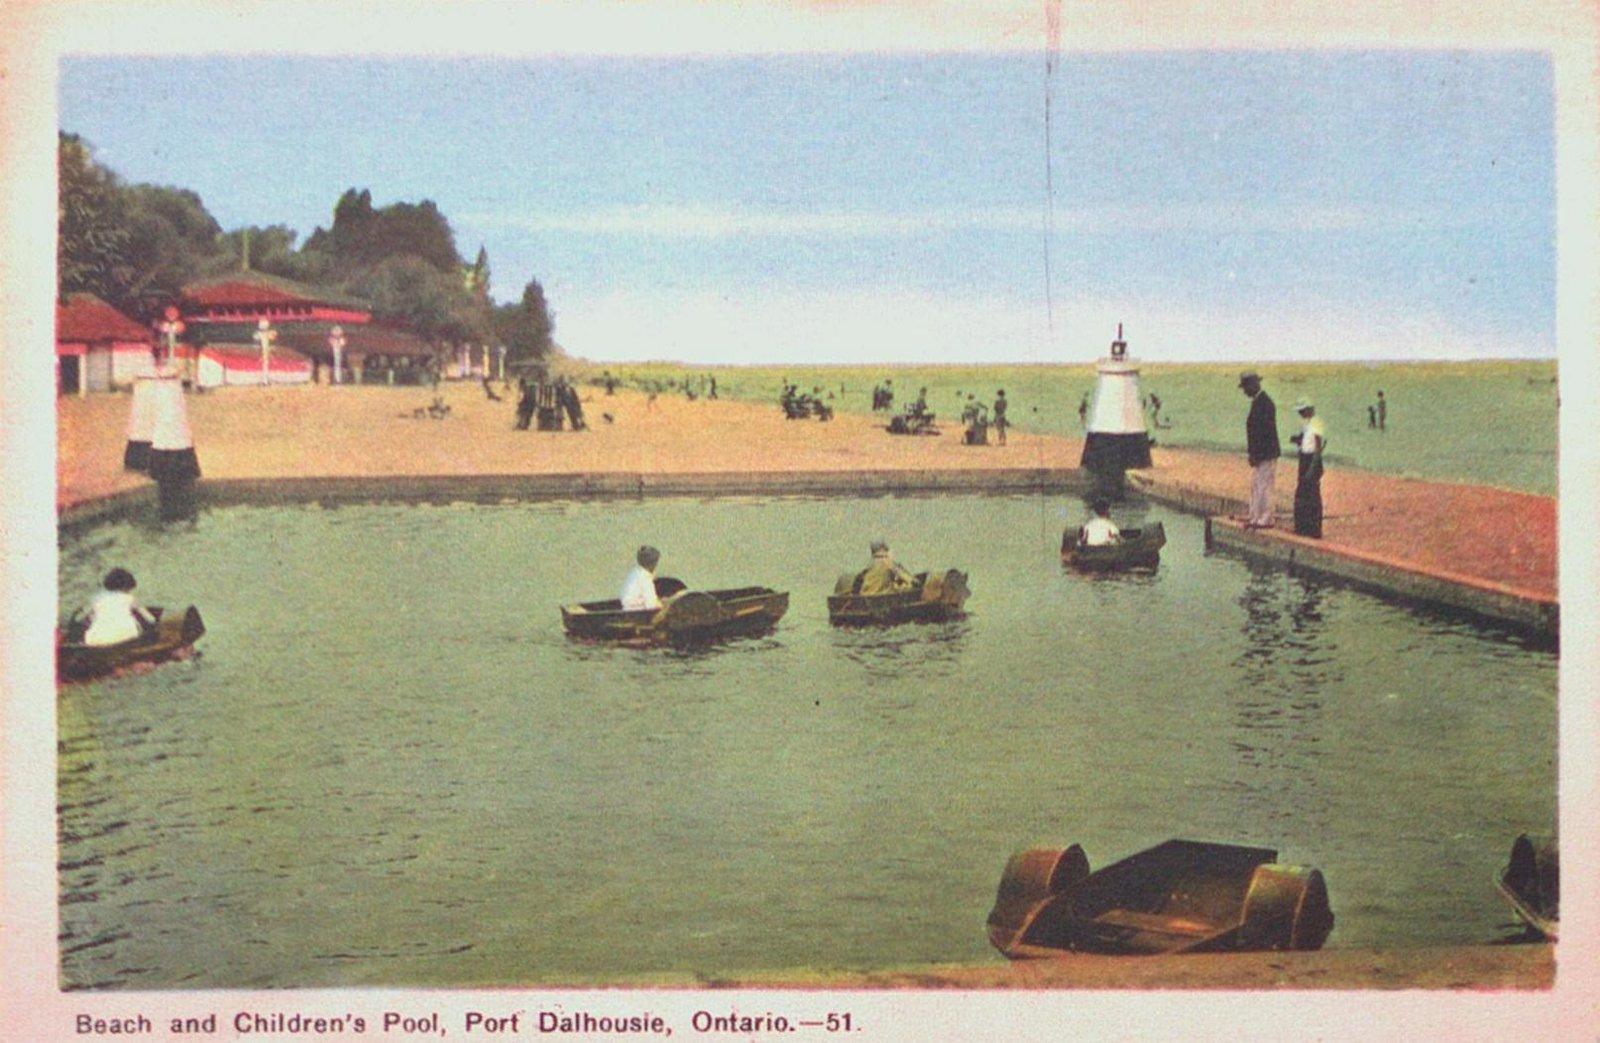 Beach and Children's Pool at Port Dalhousie